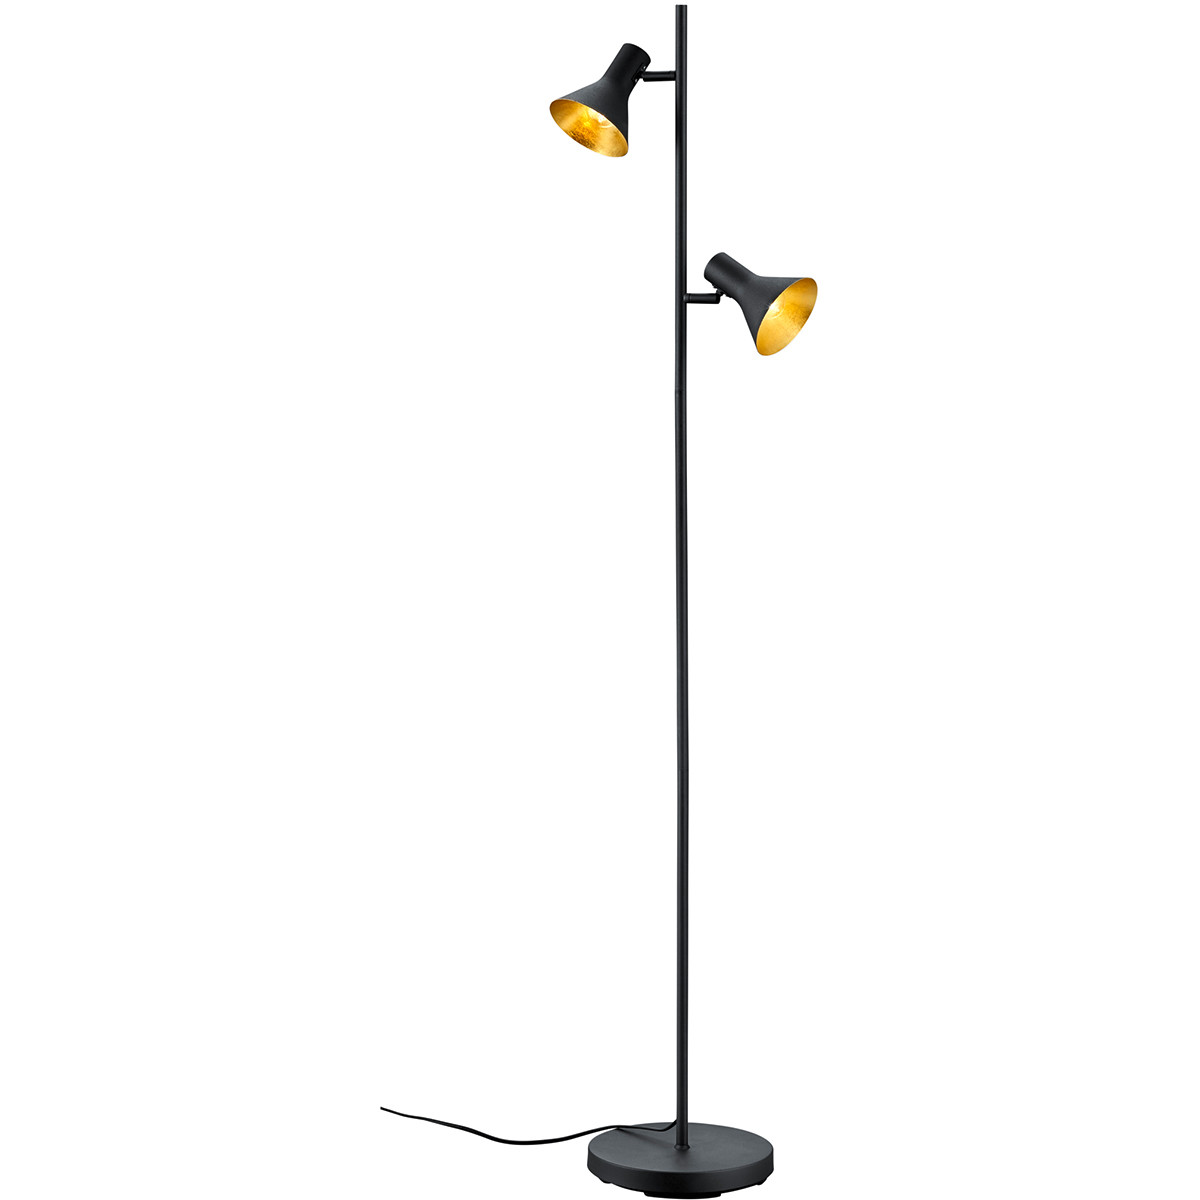 LED Vloerlamp - Trion Nana - E14 Fitting - 2-lichts - Rond - Mat Zwart - Aluminium